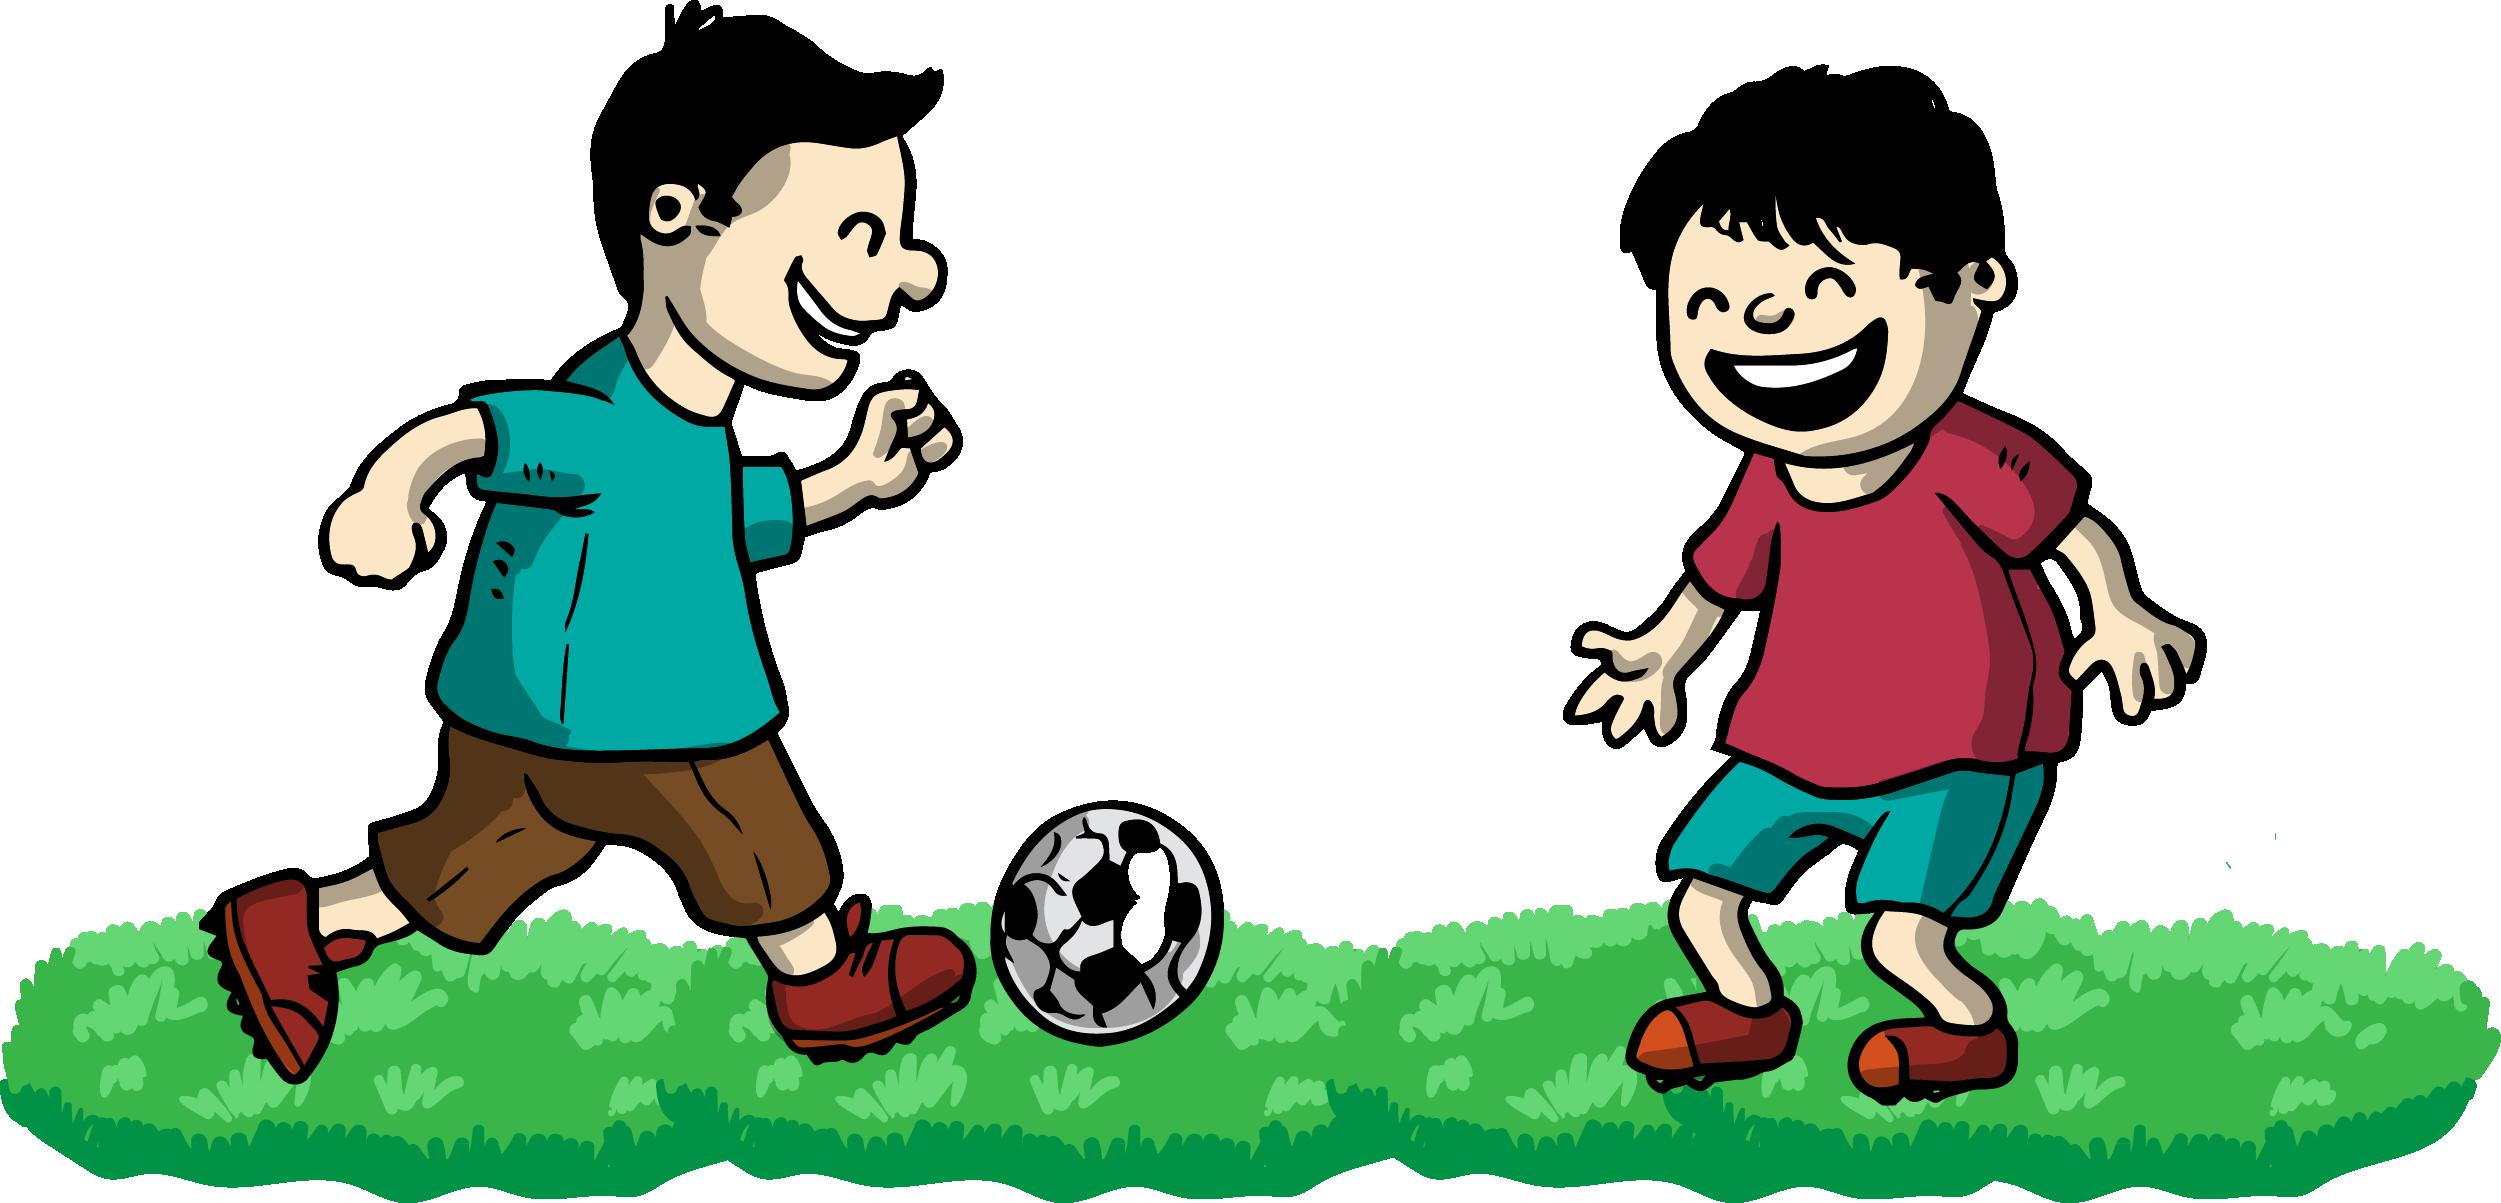 Football clip art play. Friendship clipart friend share